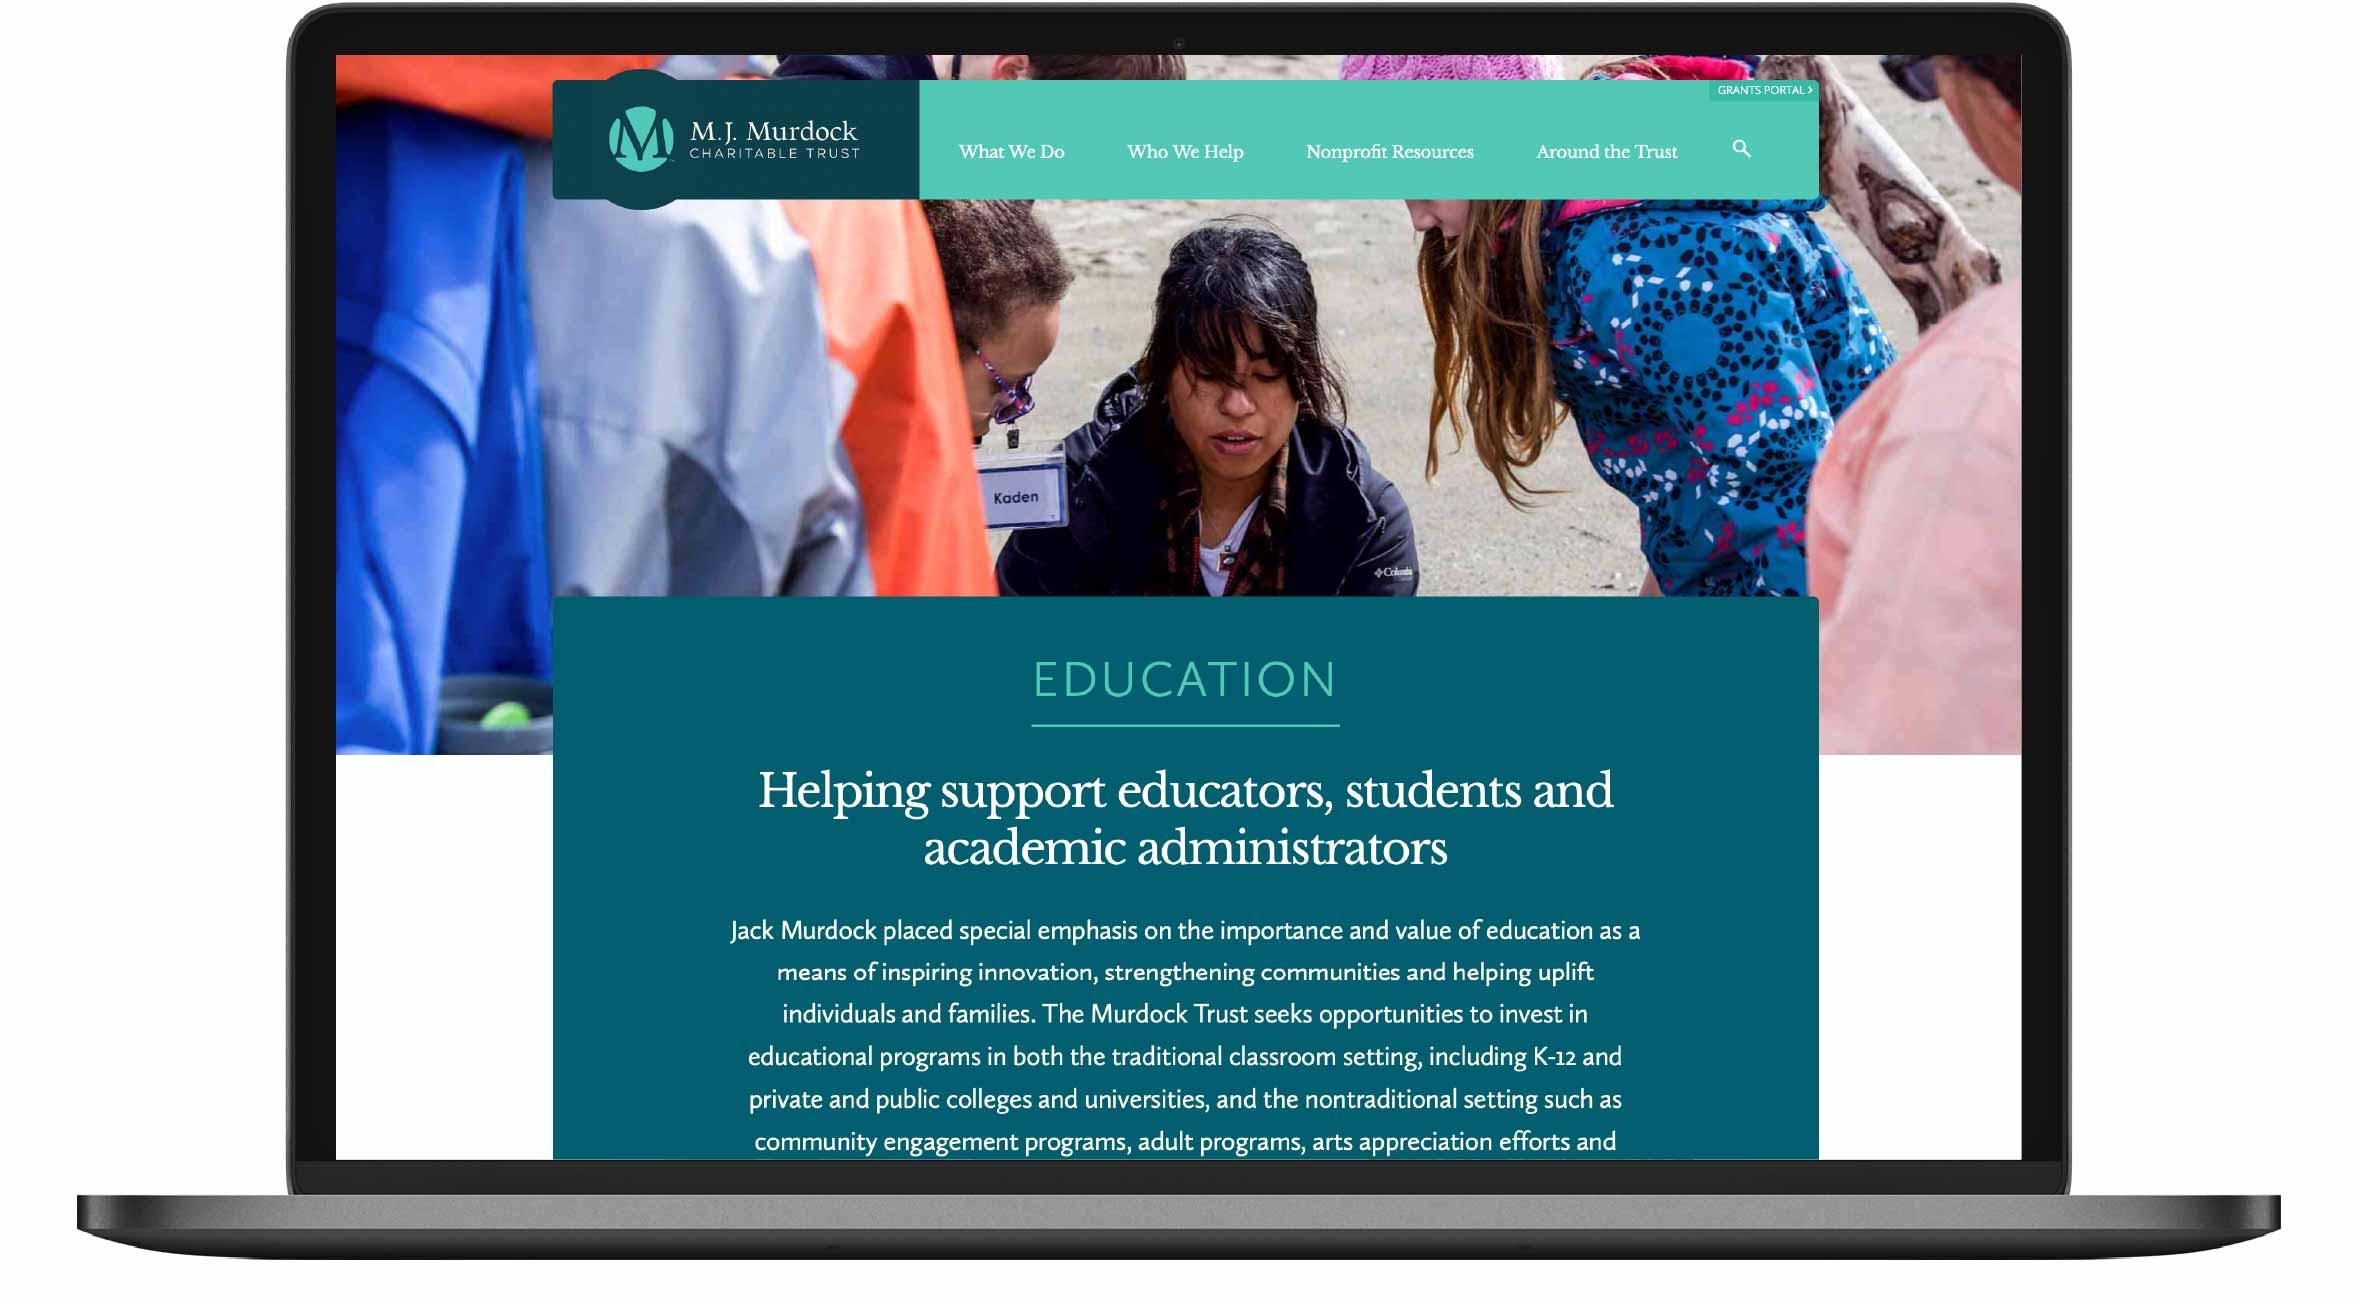 Screenshot of M.J. Murdock Charitable Trust sector page on laptop